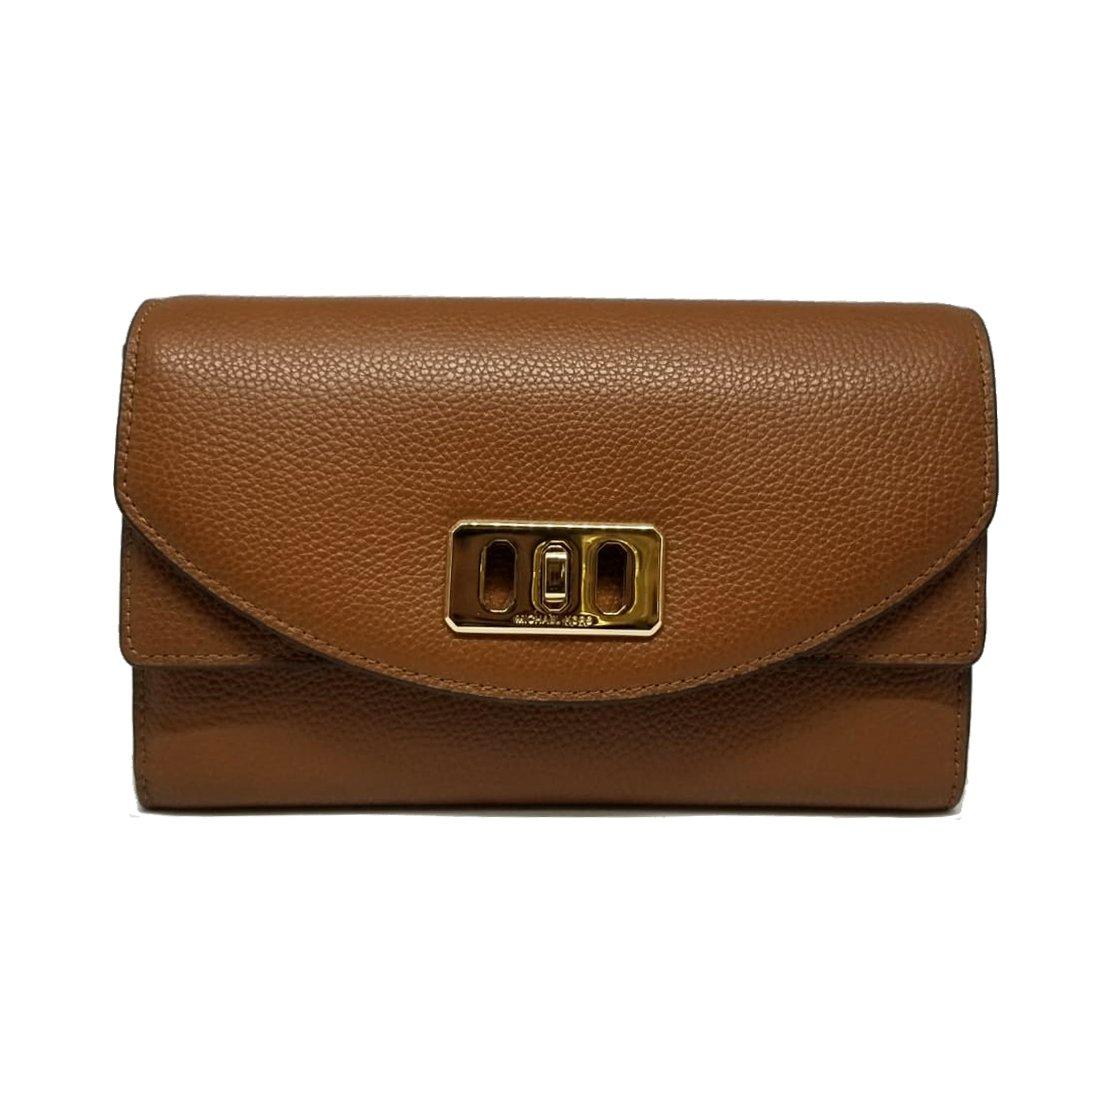 Michael Kors Karson Wallet Clutch Leather Luggage (35T8GKRC7L)